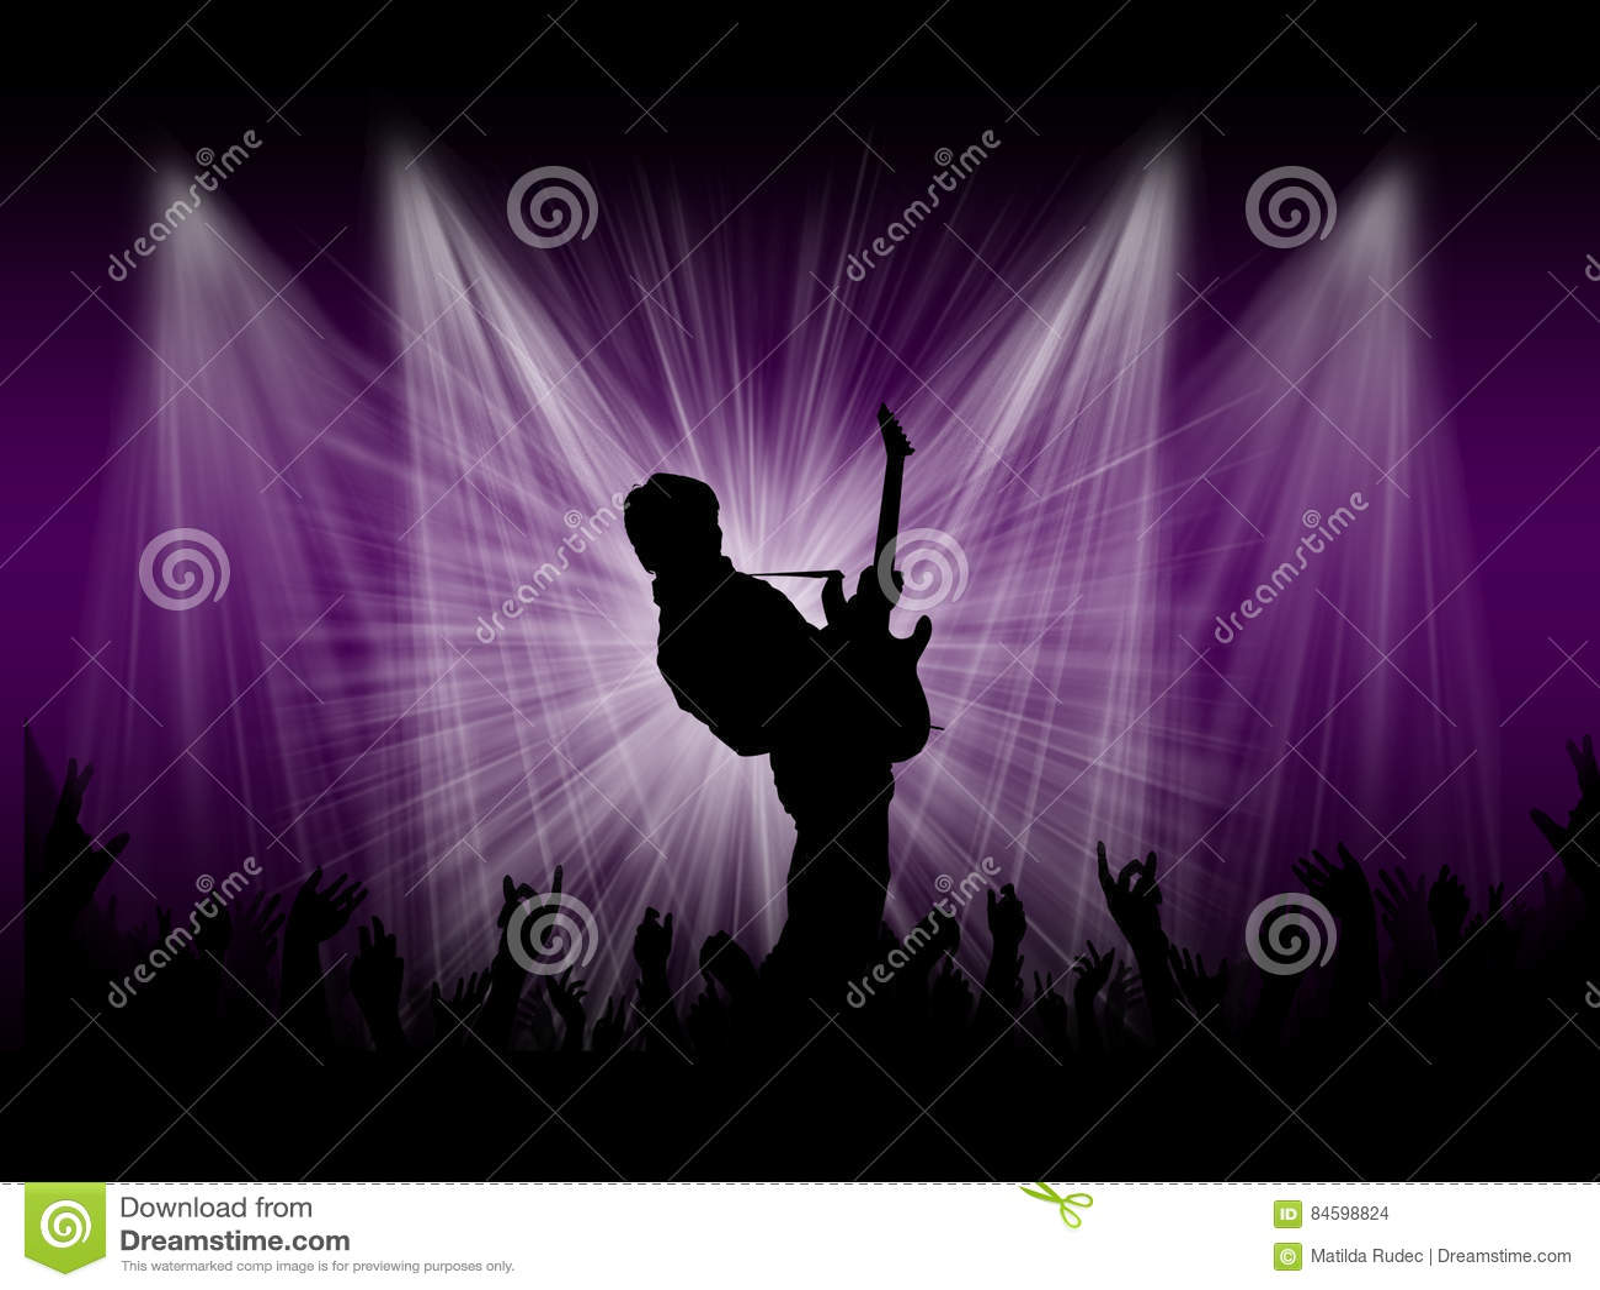 rock stage background wwwpixsharkcom images